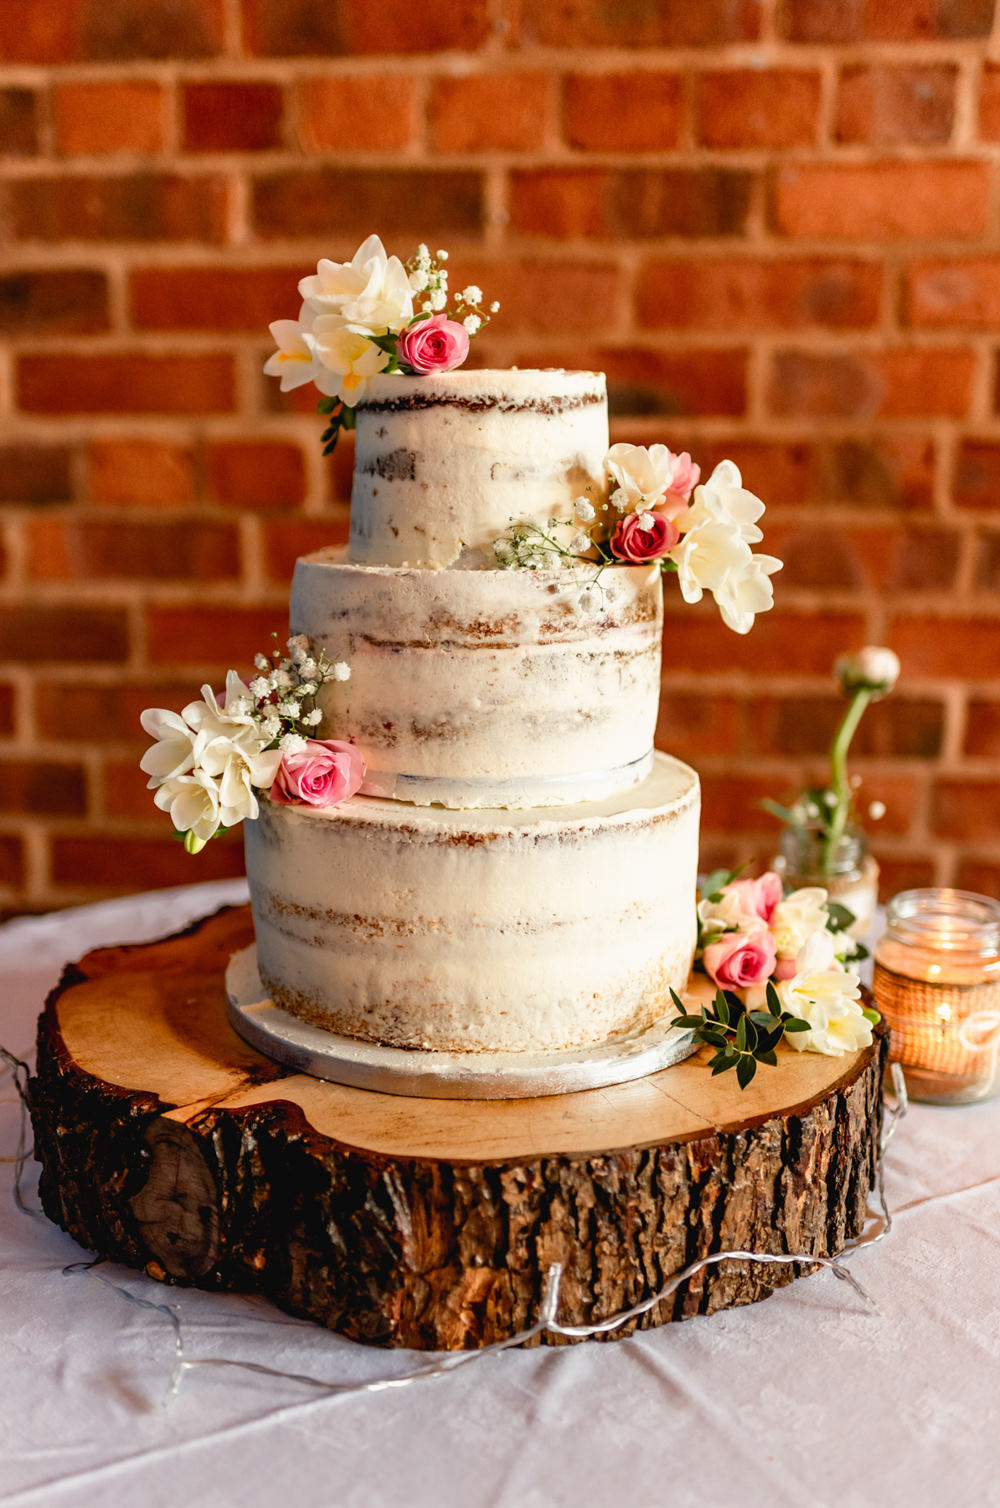 Semi Naked Cake Log Slice Cake Stand Avoncroft Museum Wedding Lisa Carpenter Photography